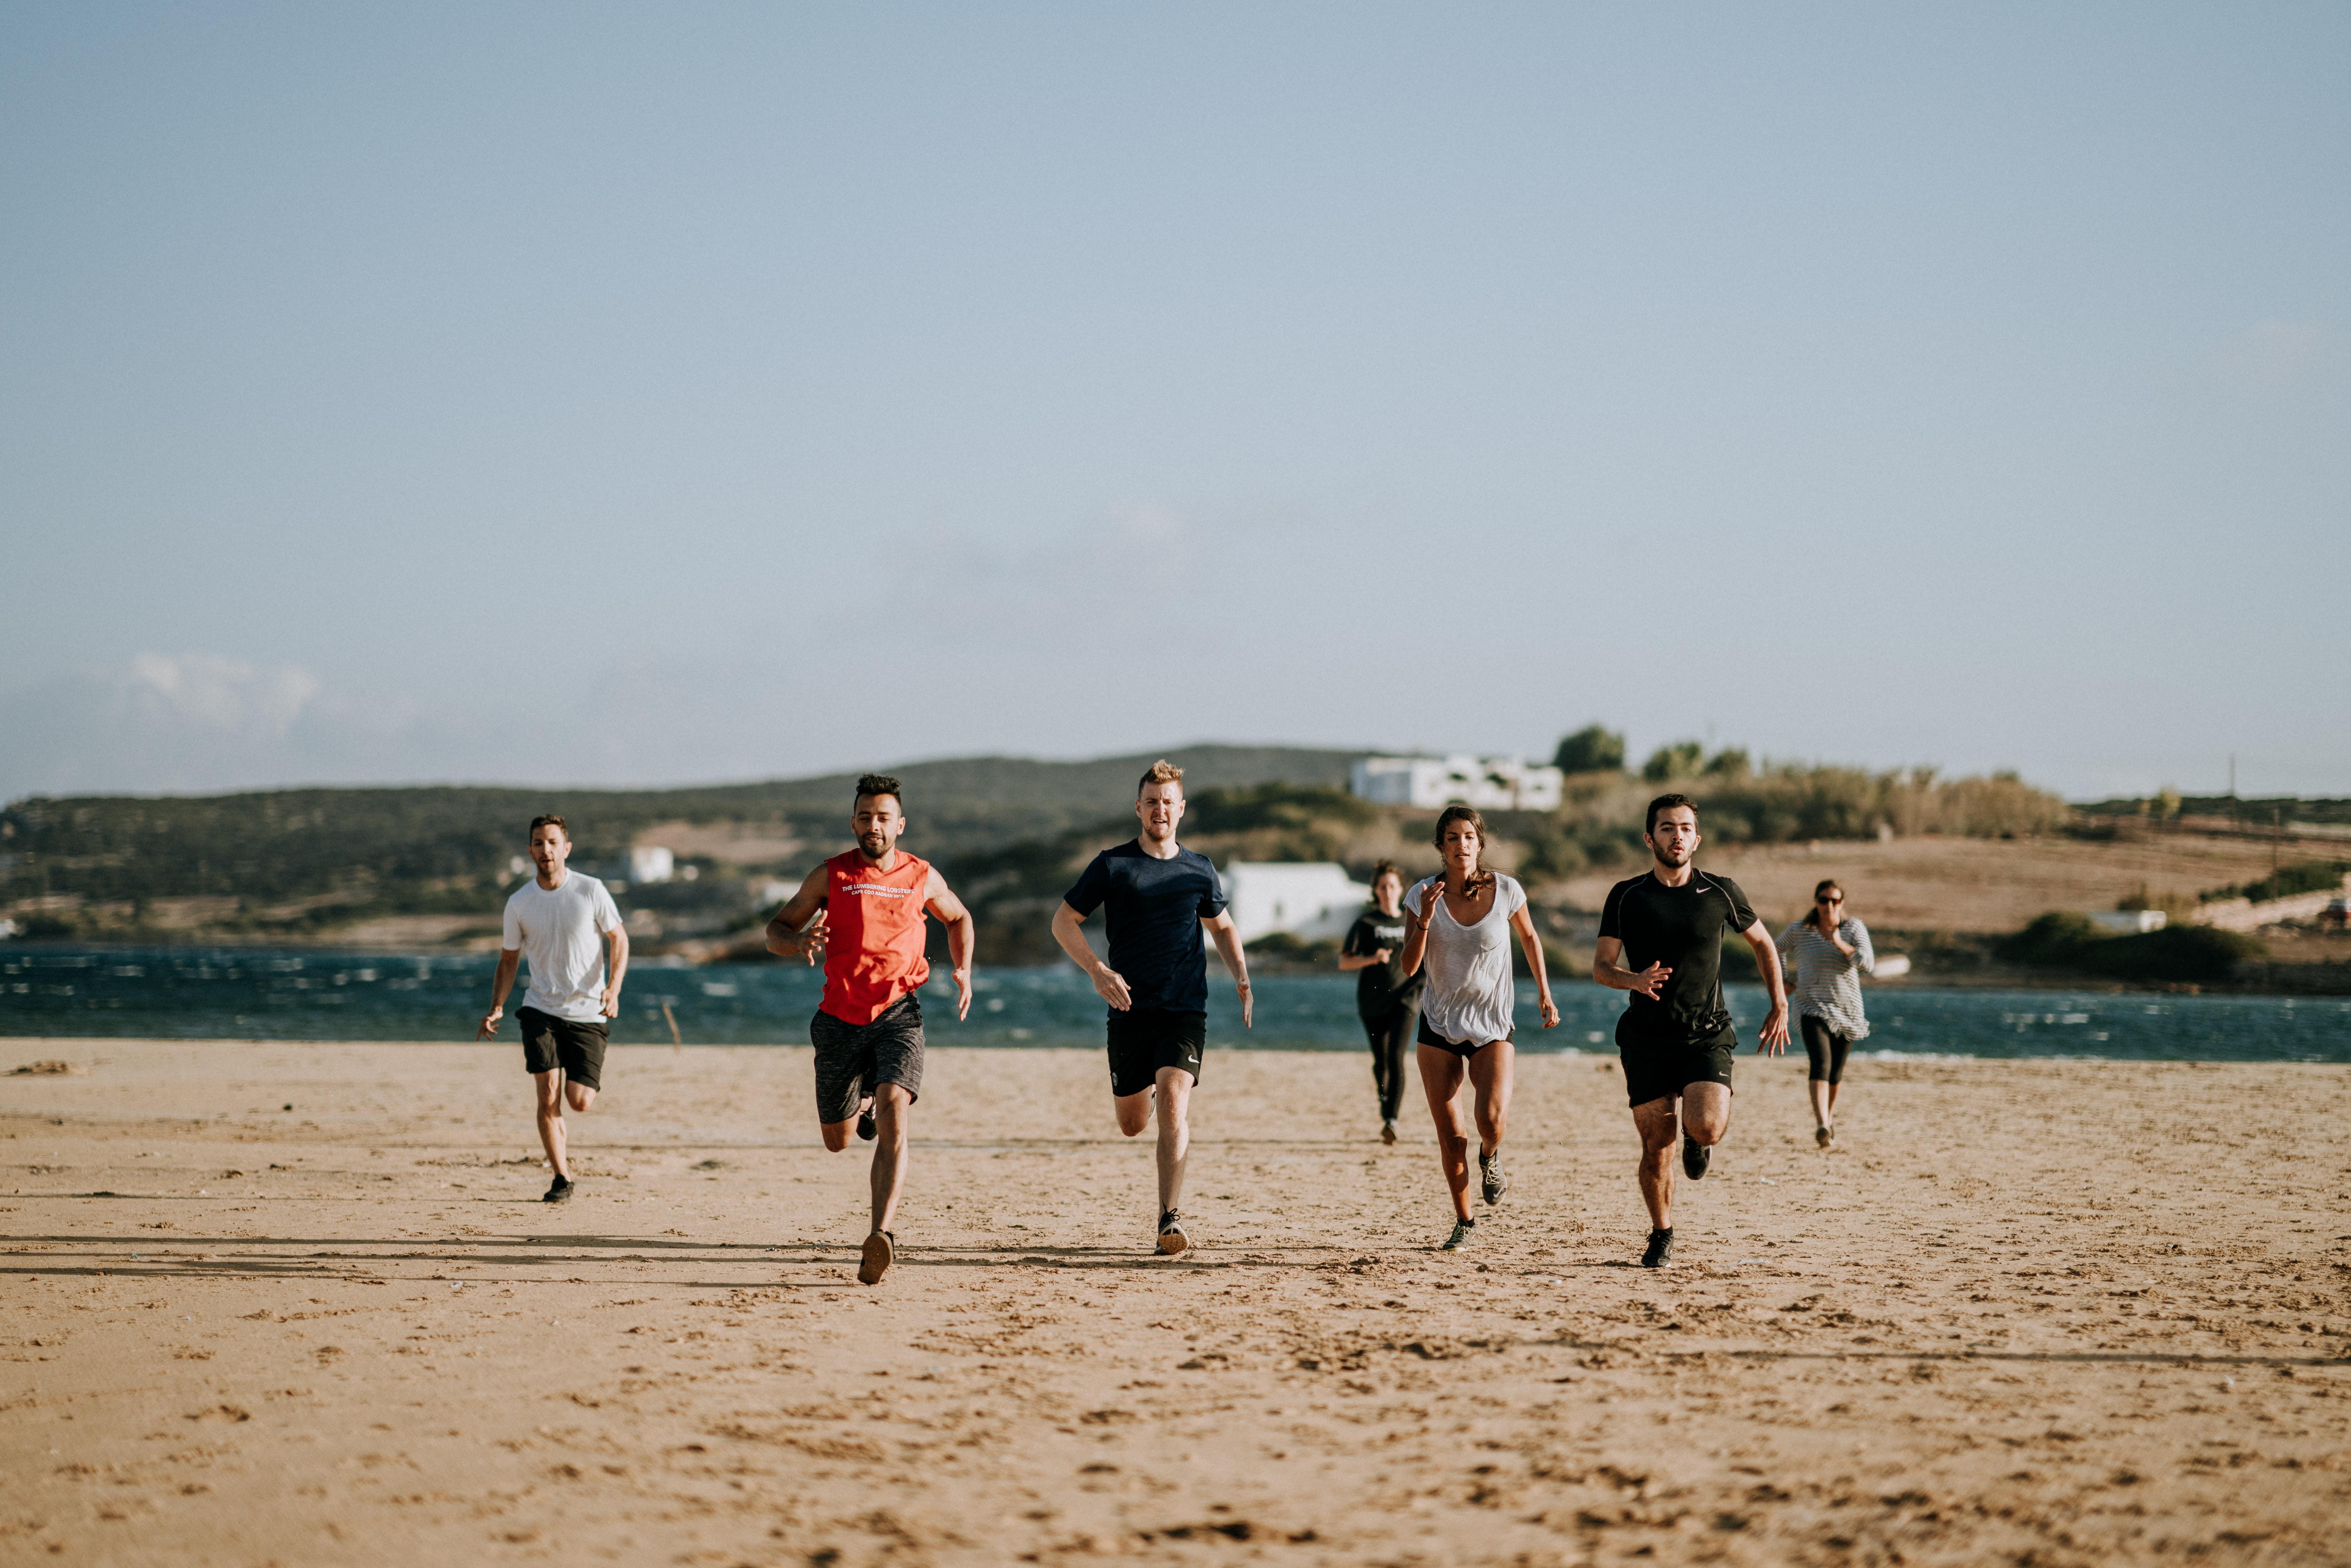 Lauftraining am Strand